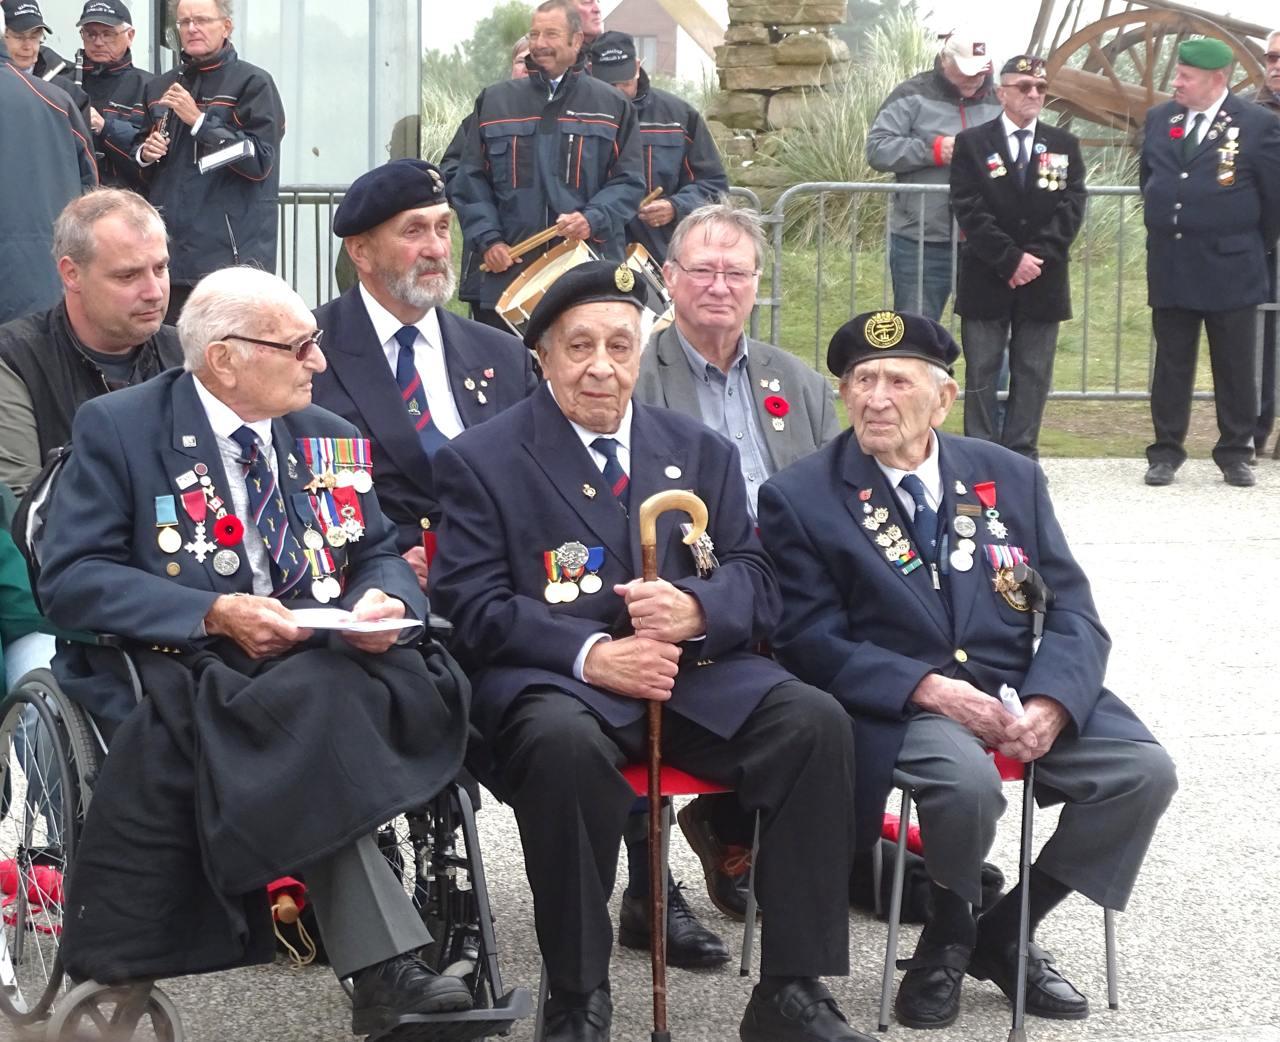 Normandy Juno Beach commemoration June 6